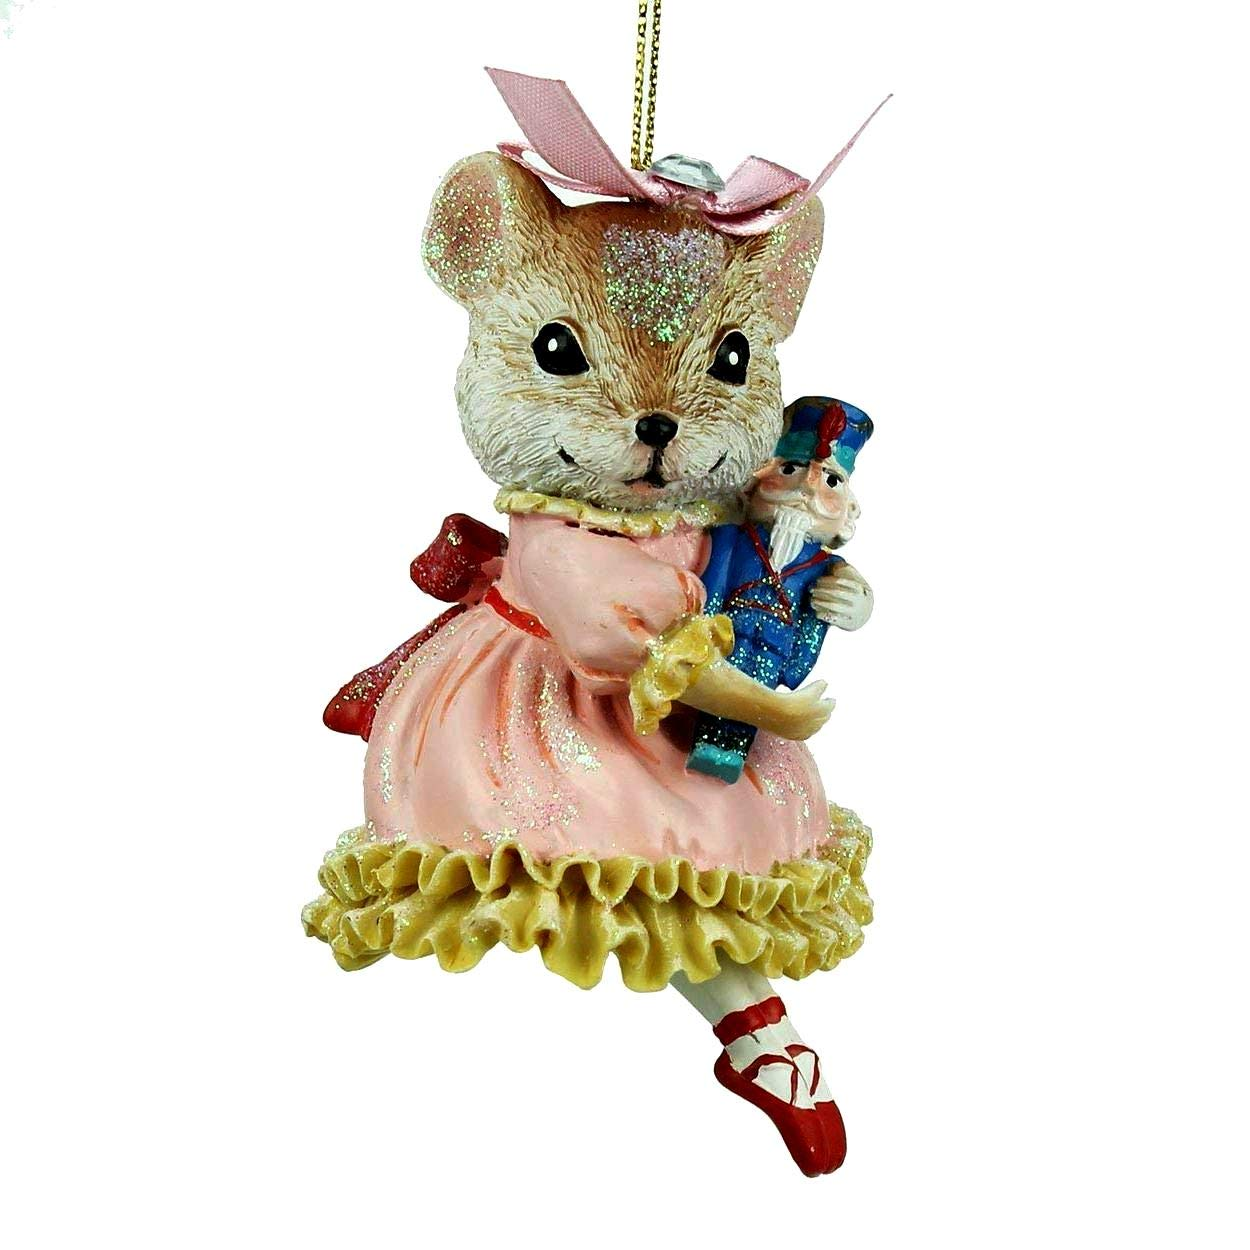 Clara and Her Prince Nutcracker Mouse Sugar Plum Fairy Ballerina Tree Decoration Gisela Graham ACHARACTERSHOP